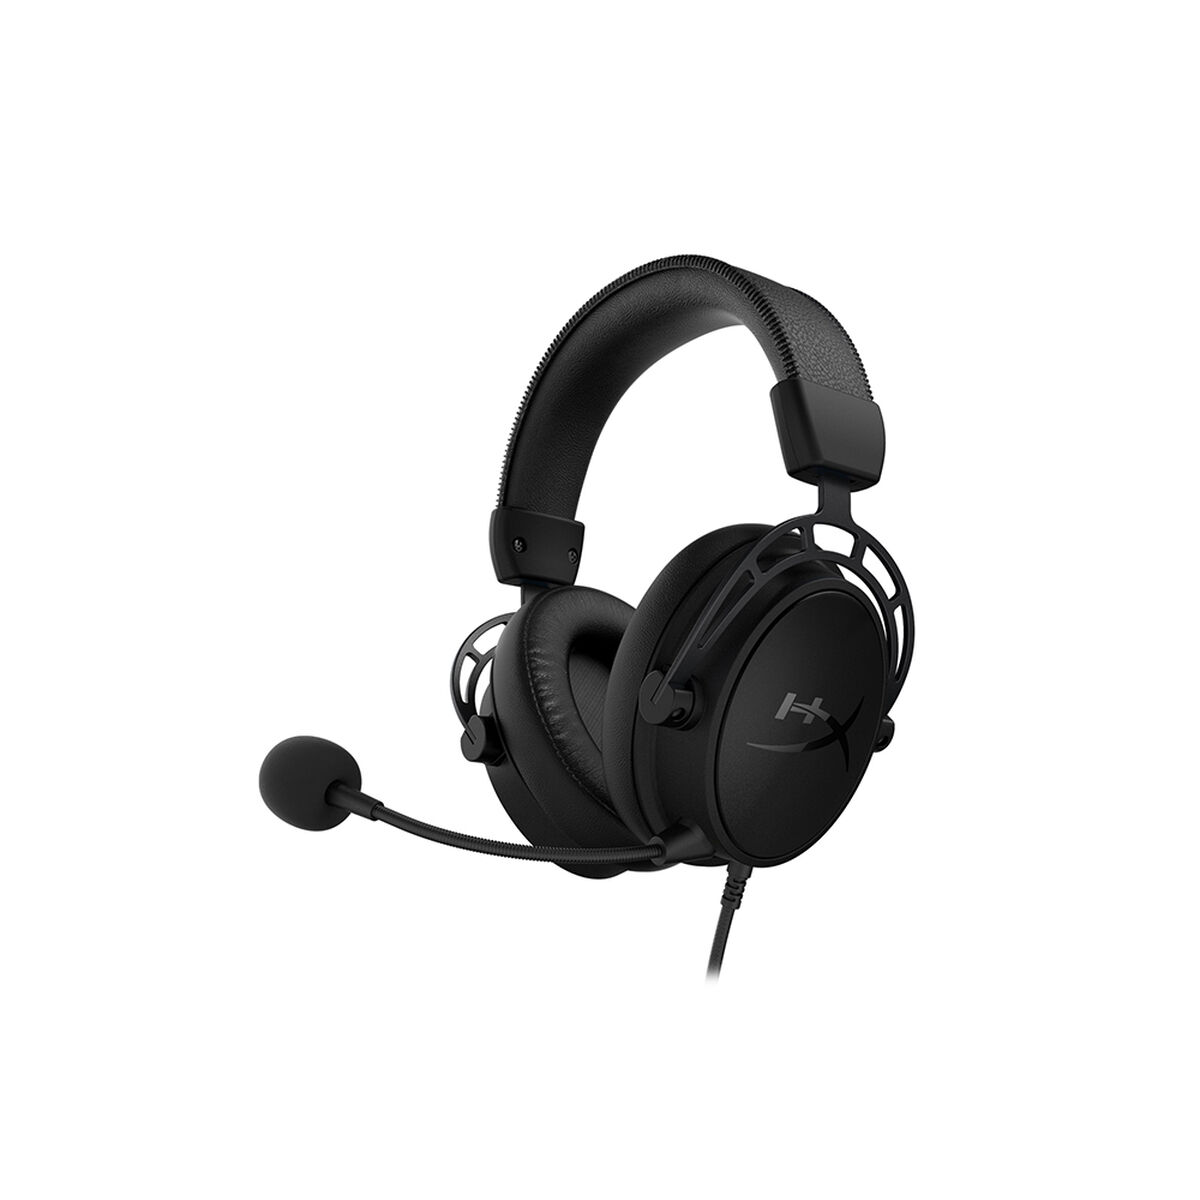 Audífonos Gamer HyperX Cloud Alpha S 7.1 Negros